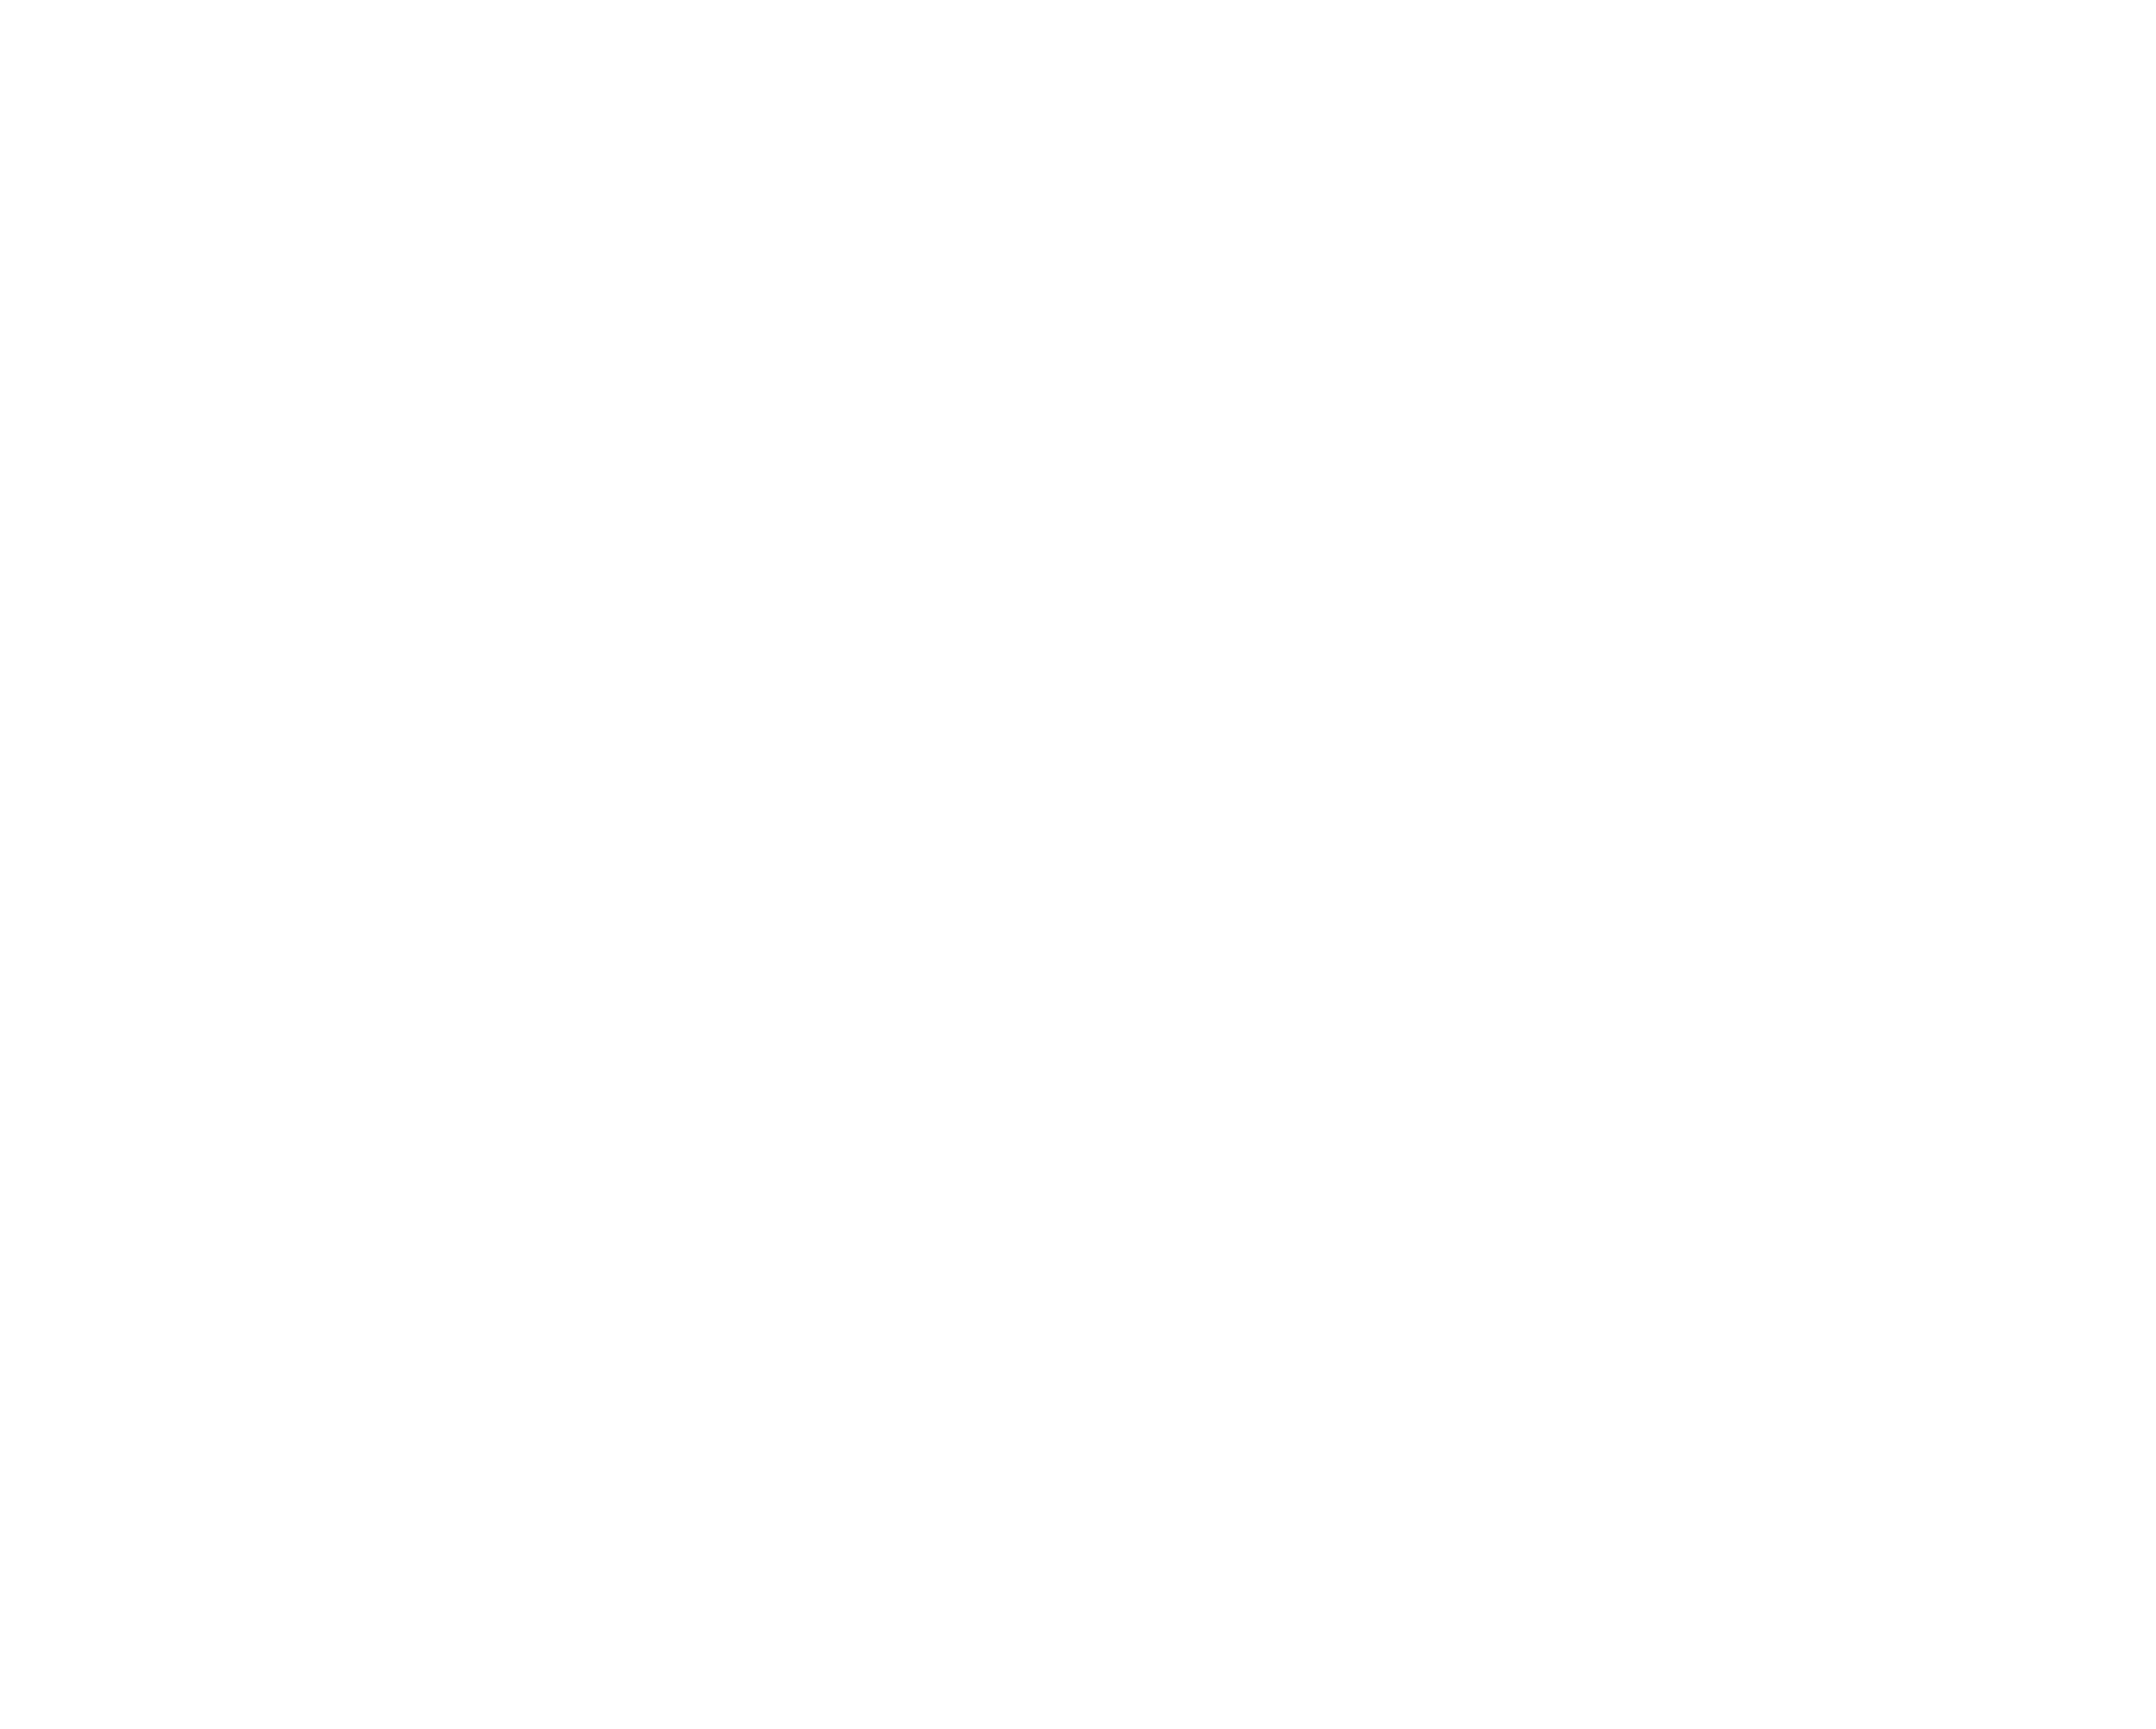 image-transparent